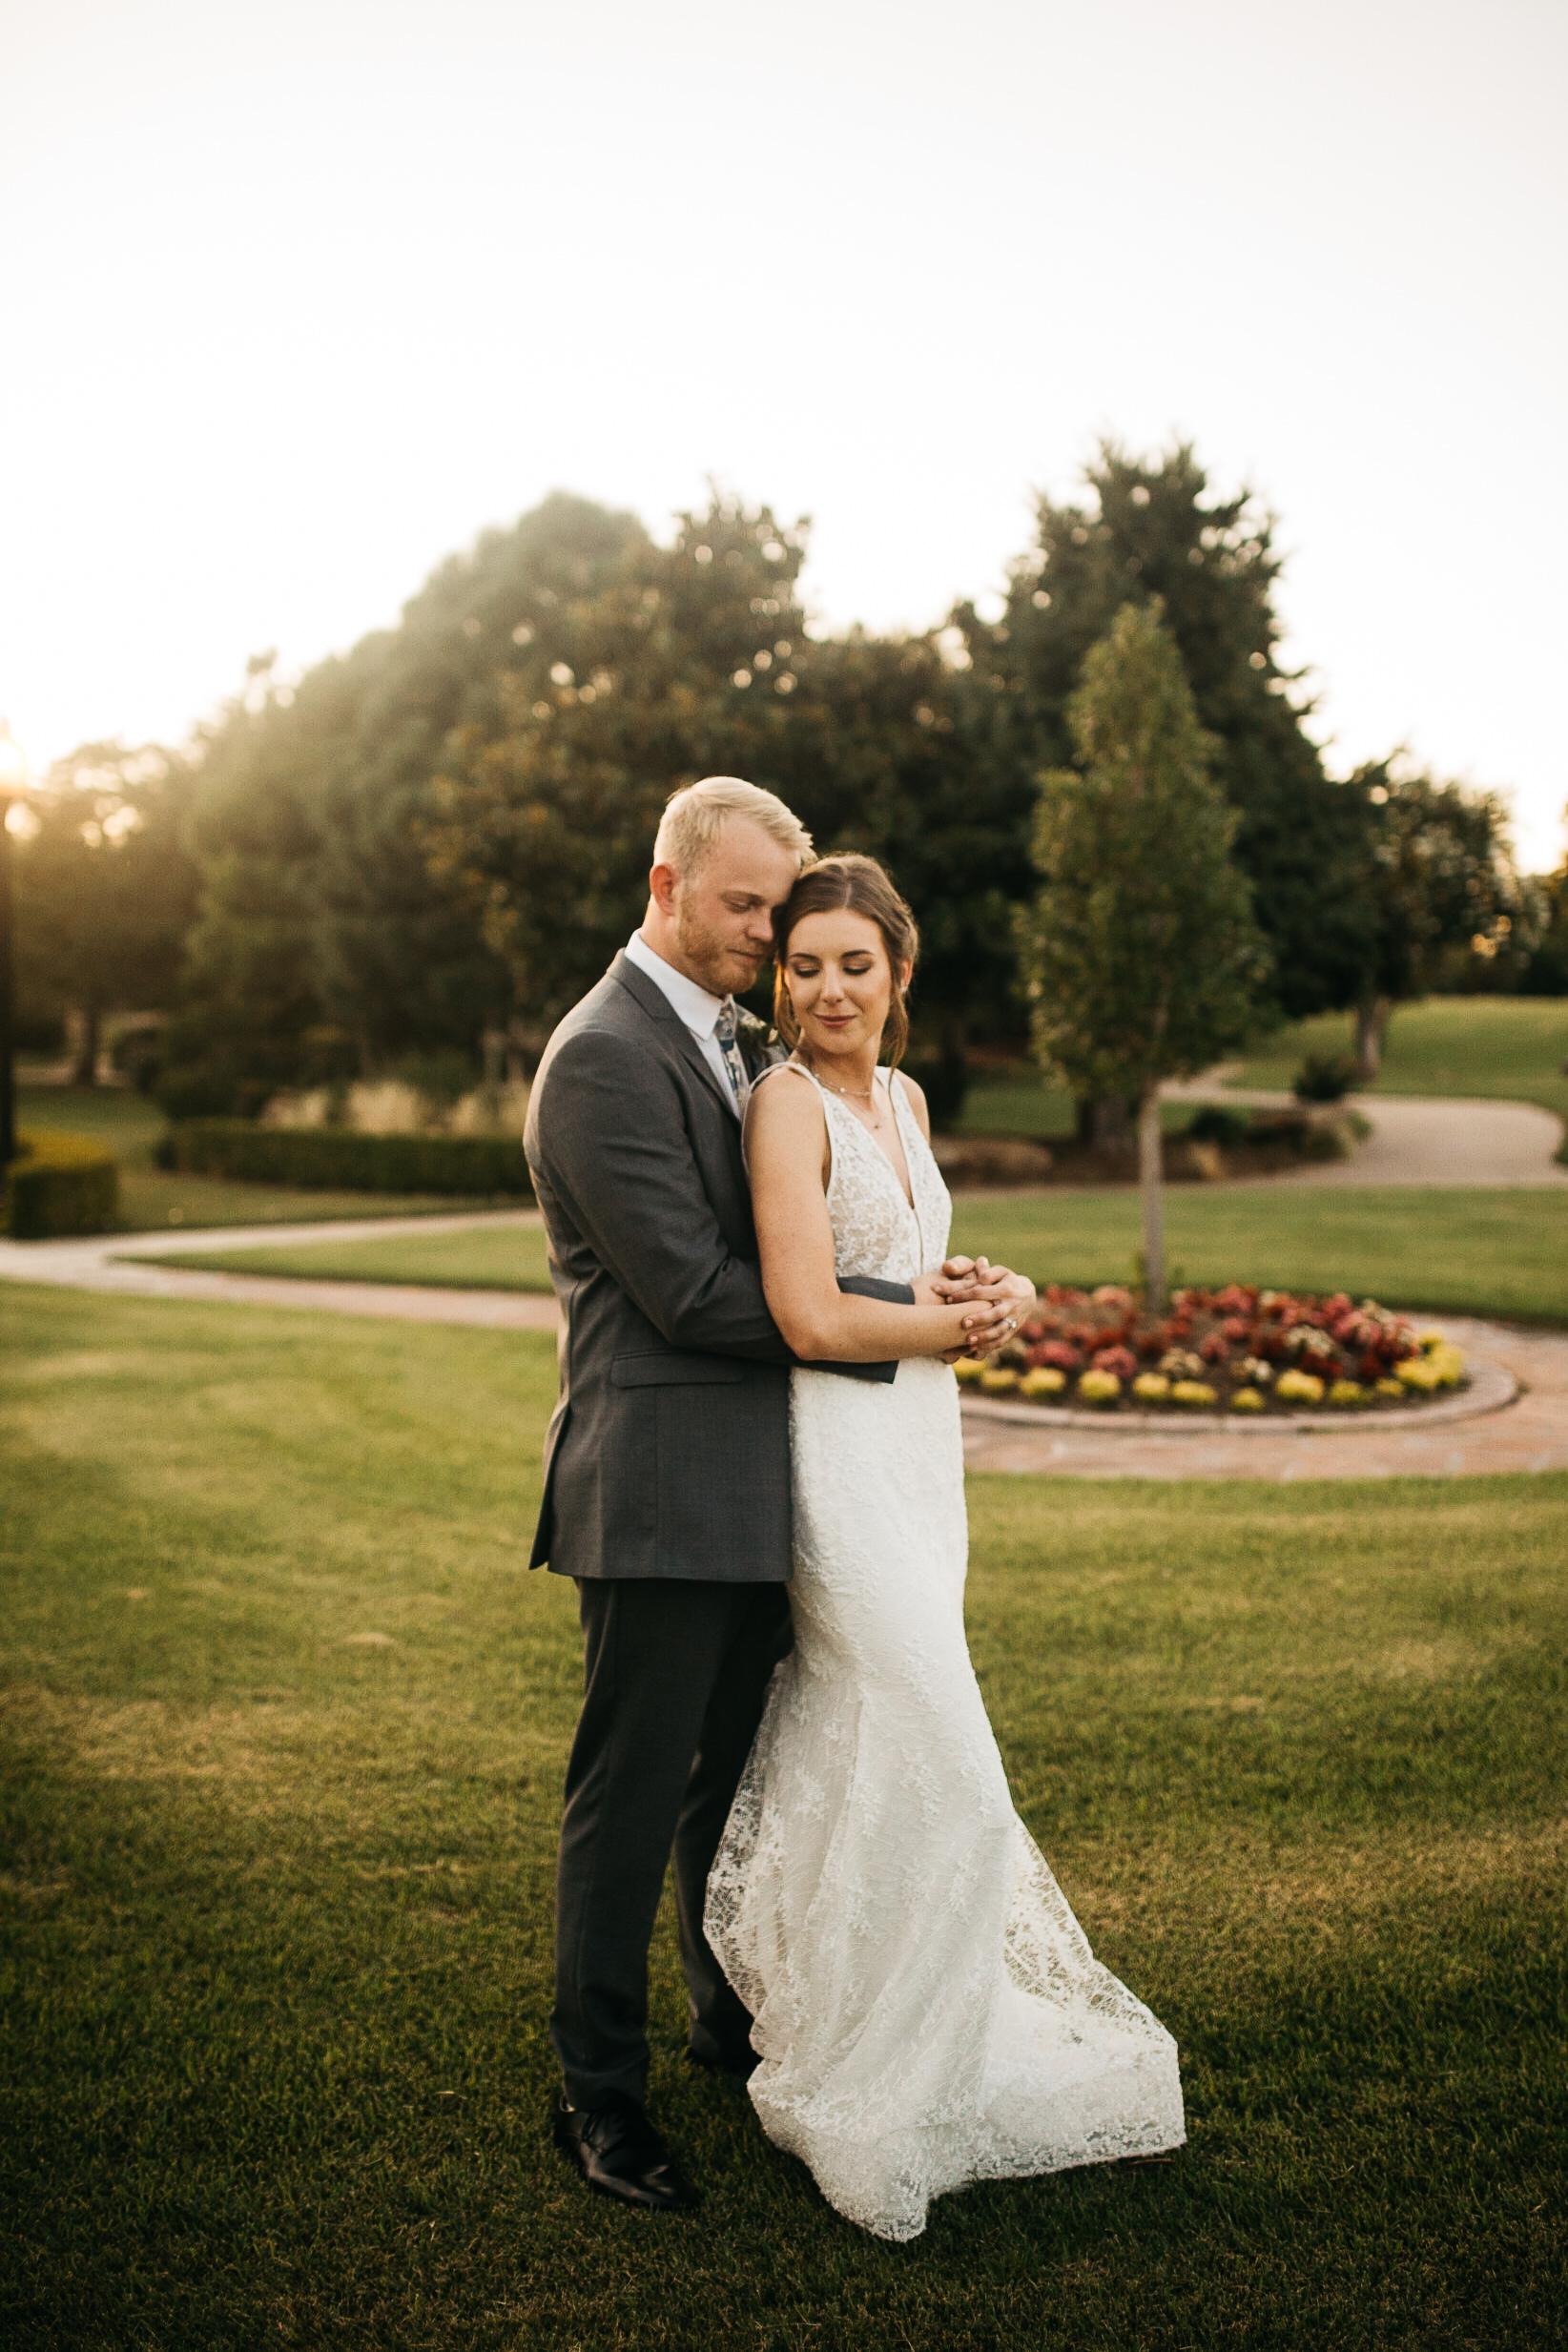 okc-wedding-photographer-coles-garden-wedding-okc-best-wedding-photographers-143.jpg